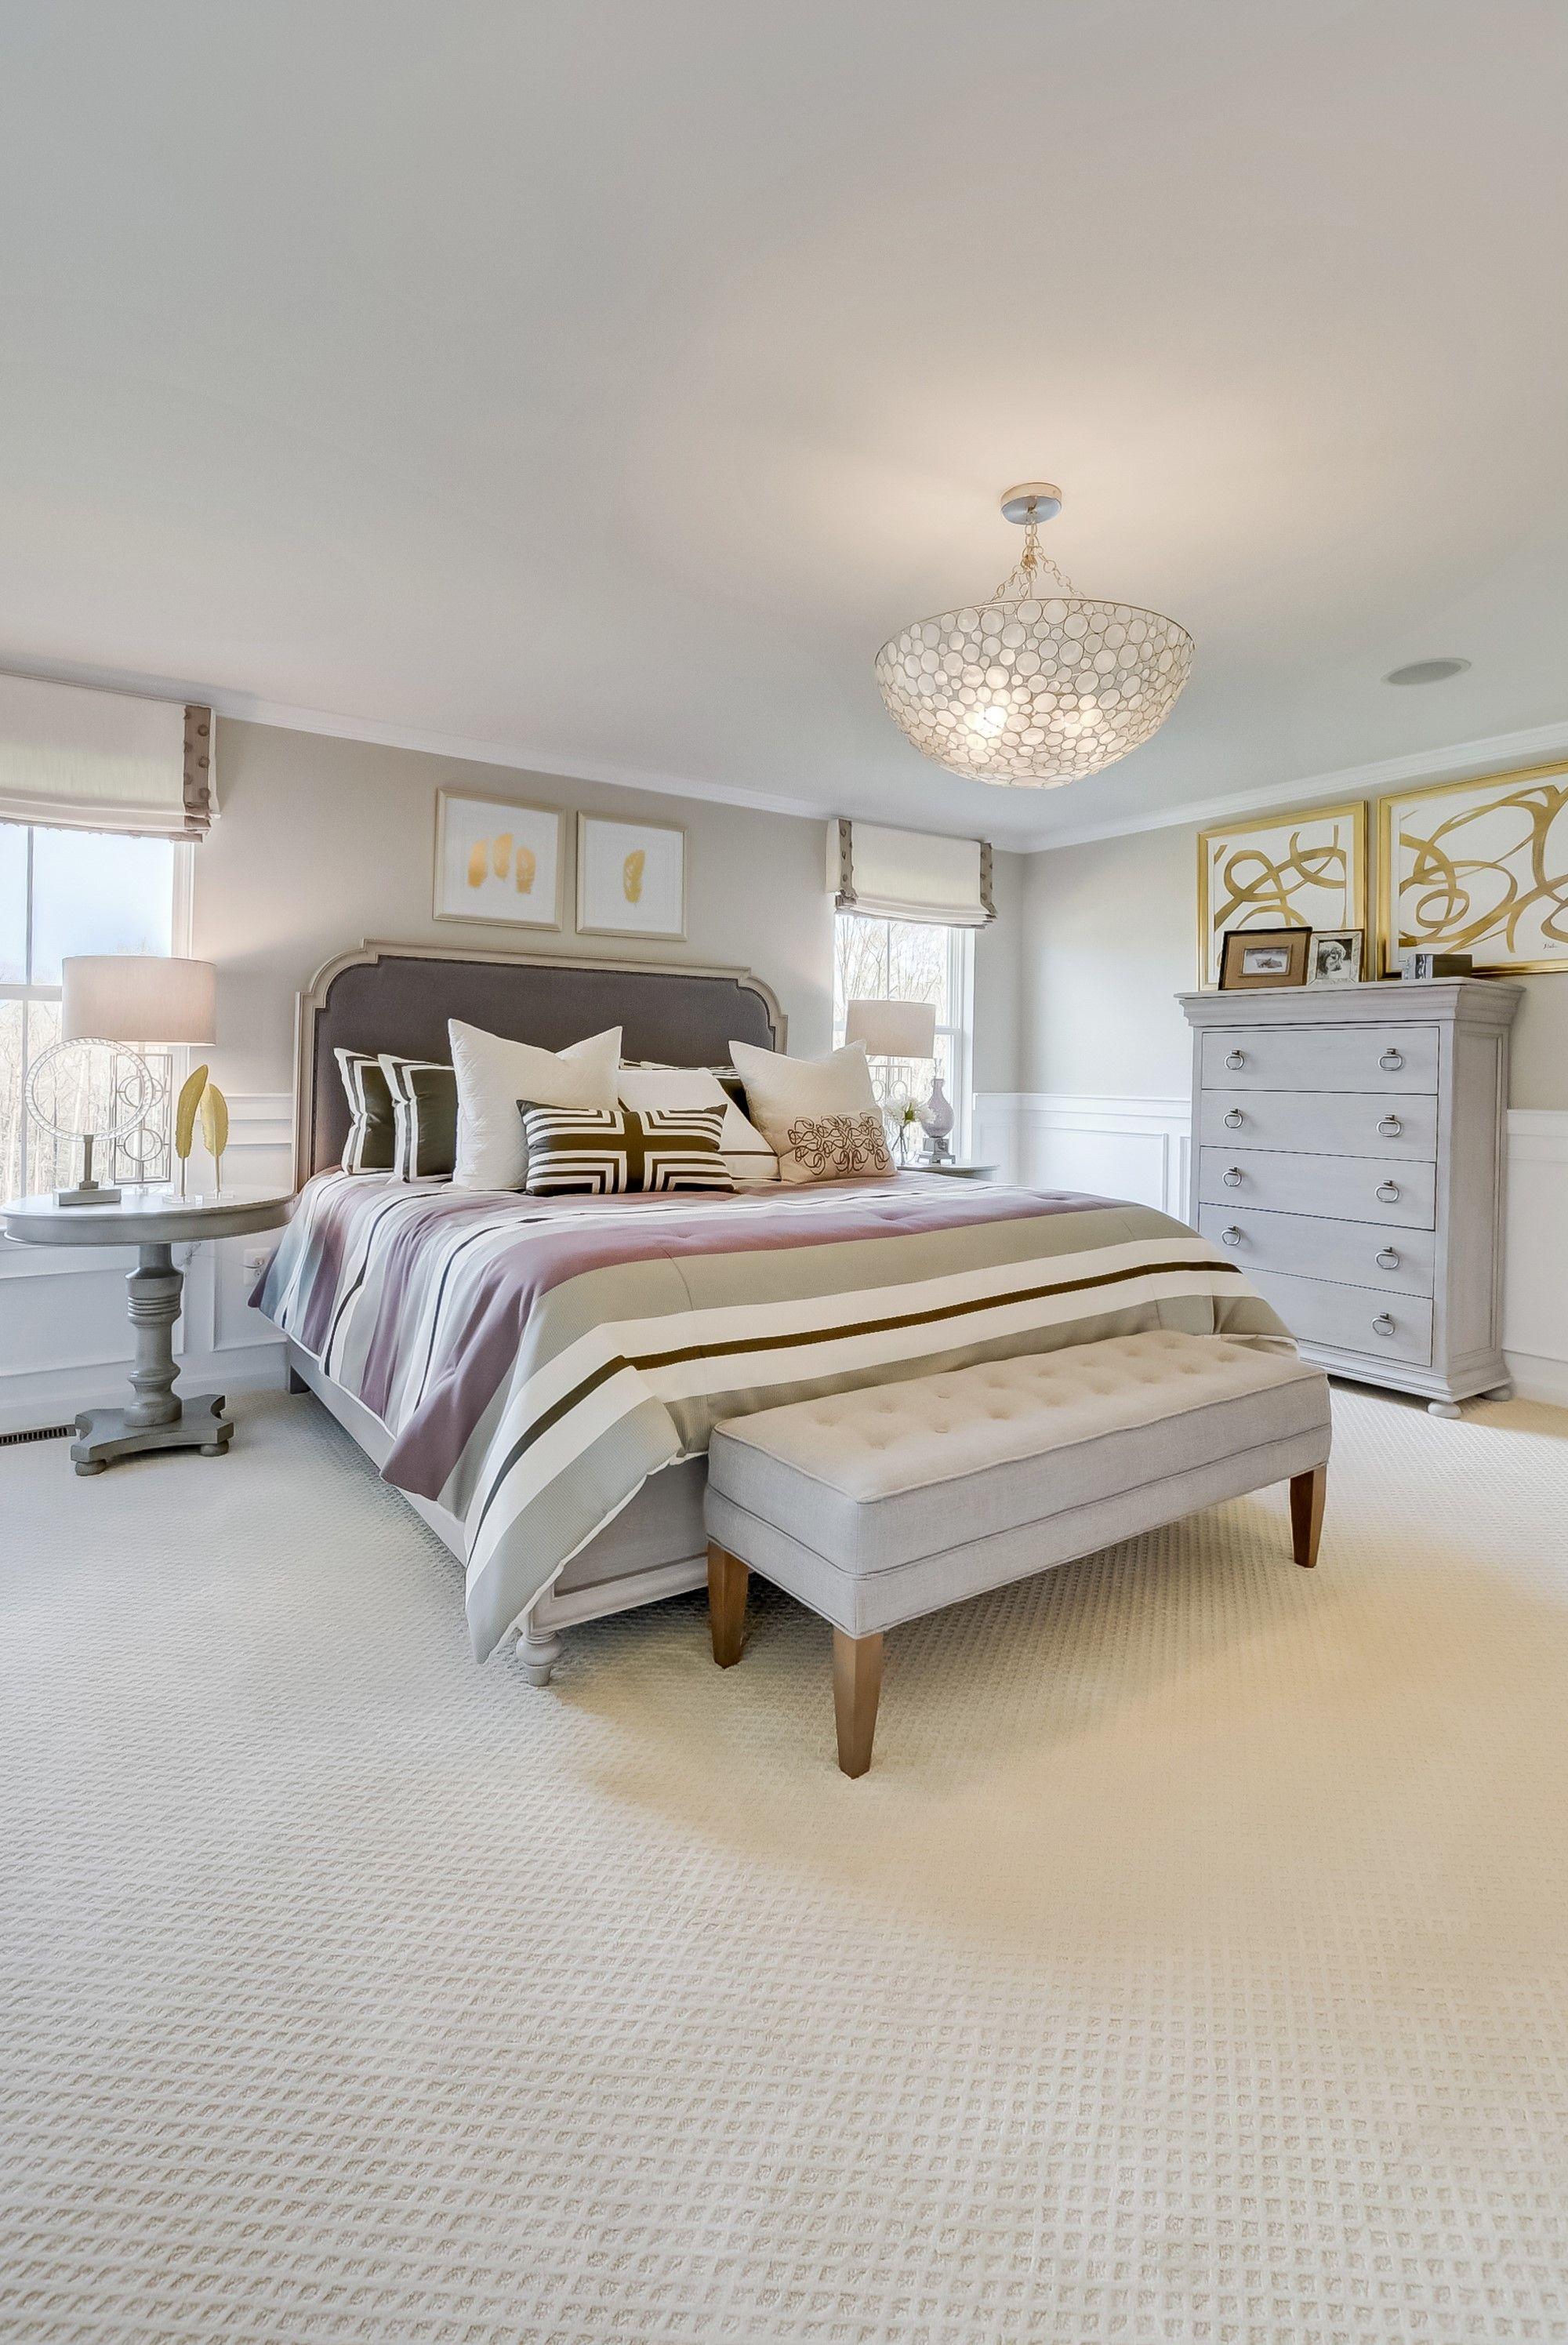 Bedroom featured in the Alaska II By K. Hovnanian® Homes in Washington, VA